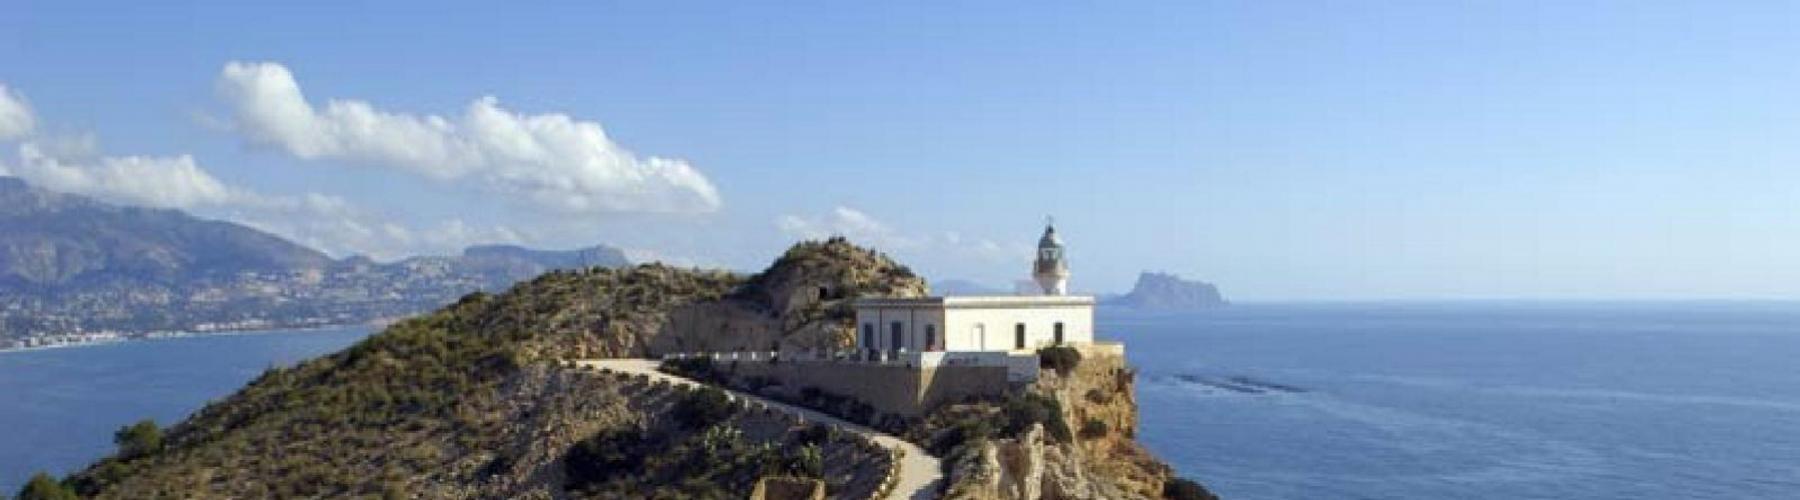 EuroTourGuide Coach Tour 30th September Albir, Optional Lighthouse Walk & Altea